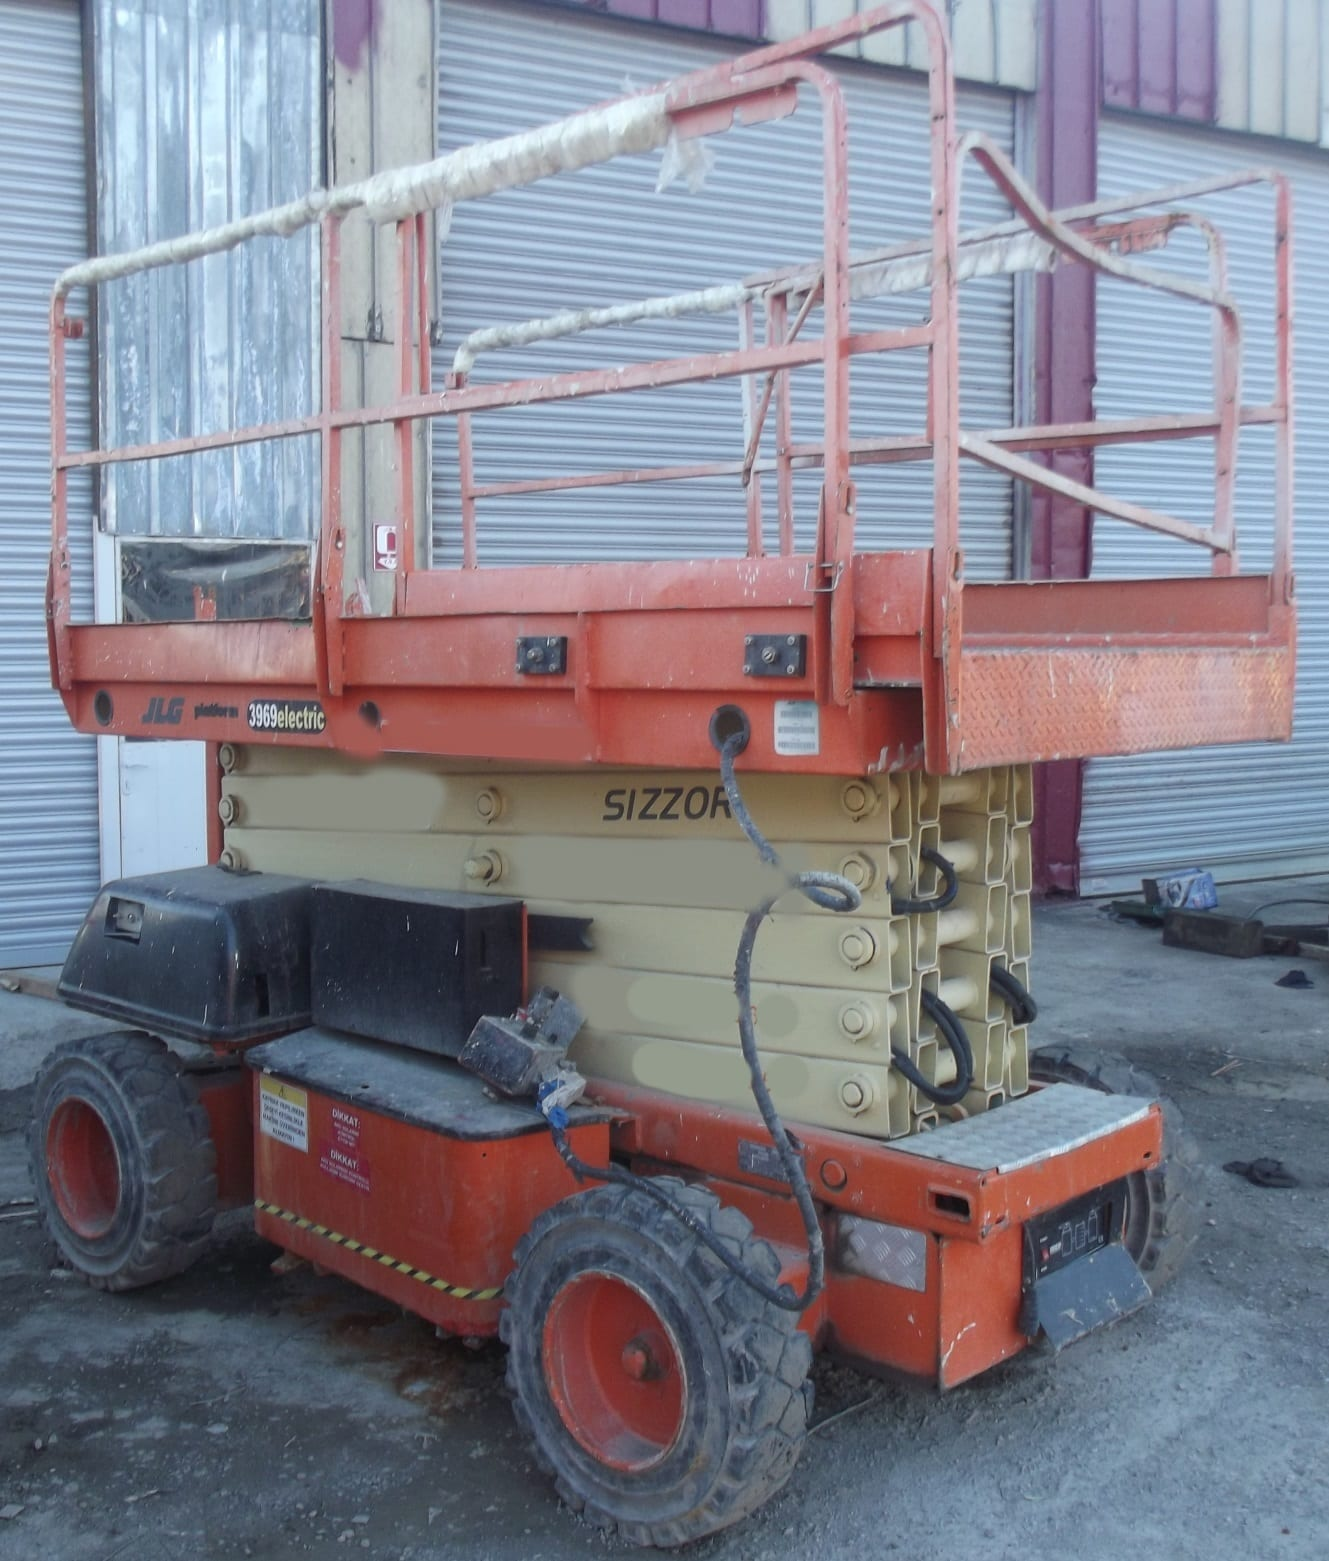 JLG 3969- İkinci El Akülü Satılık Manlift